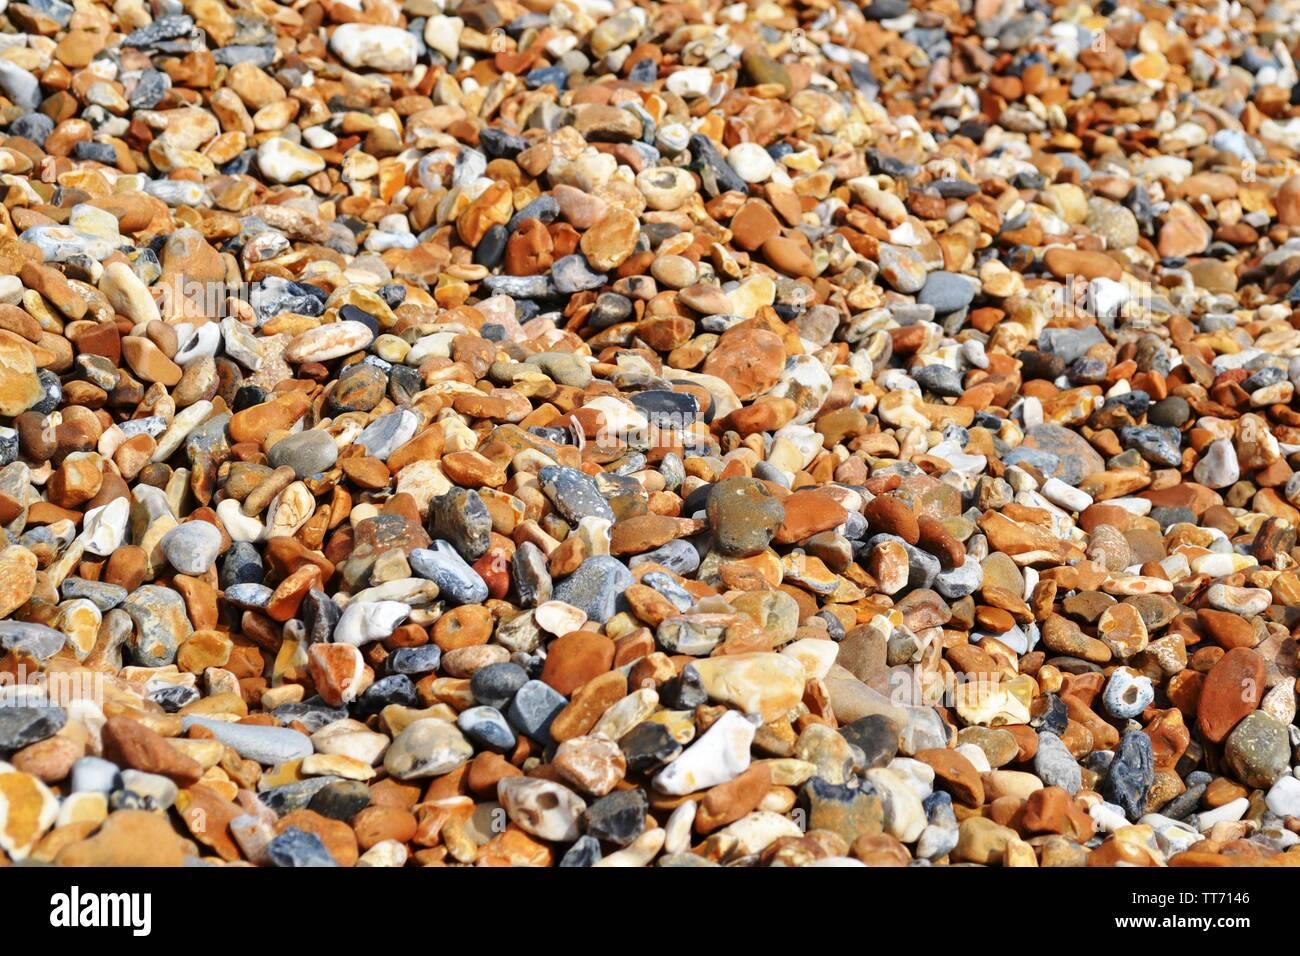 Pebble beach of big oval colorful stones brightly illuminated. Stock Photo